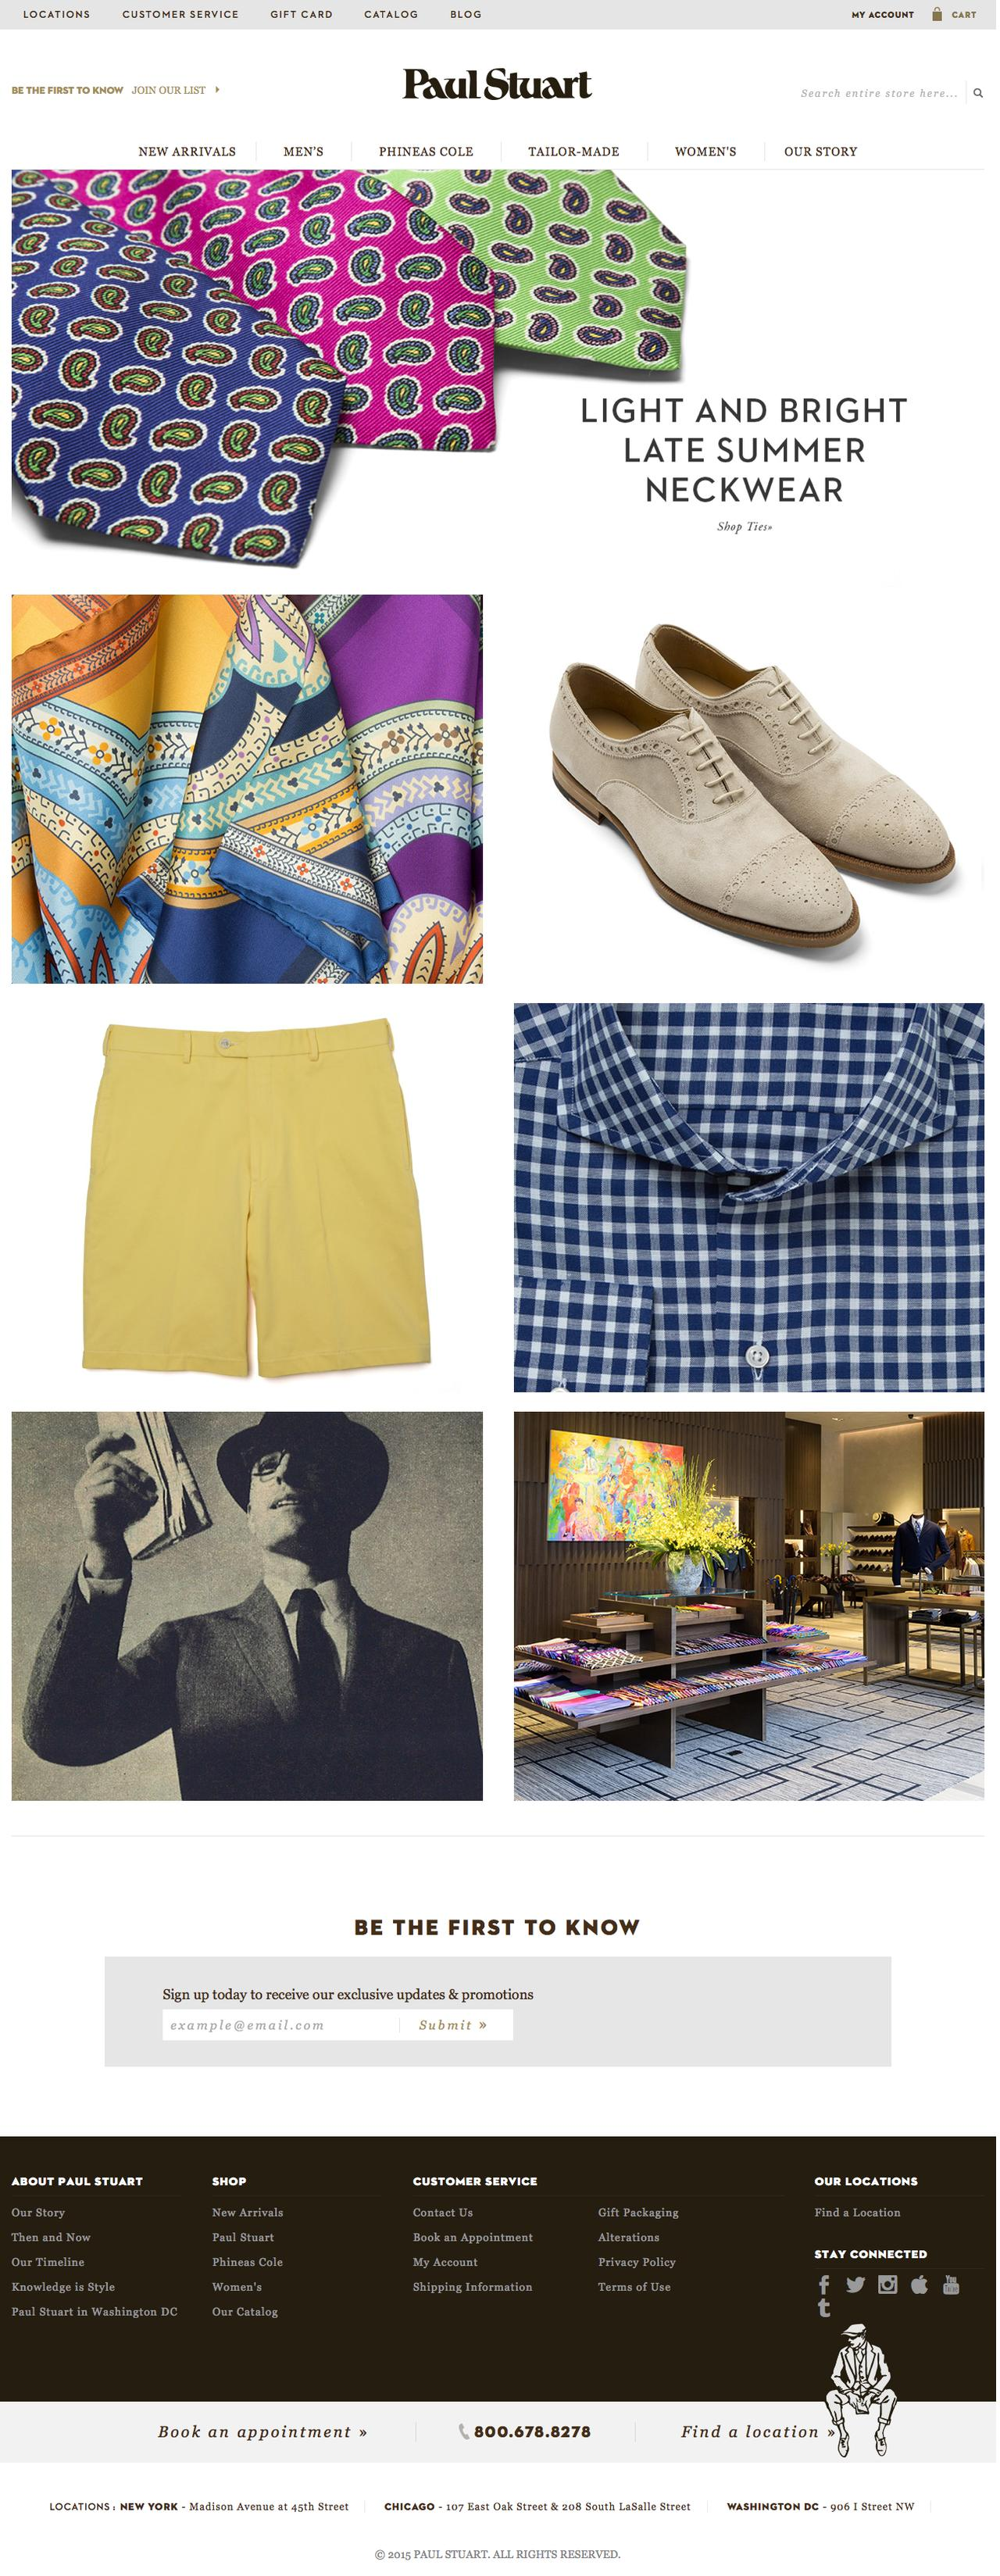 Screenshot of paulstuart.com - Paul Stuart - Fine Men's & Women's clothing - captured July 27, 2015